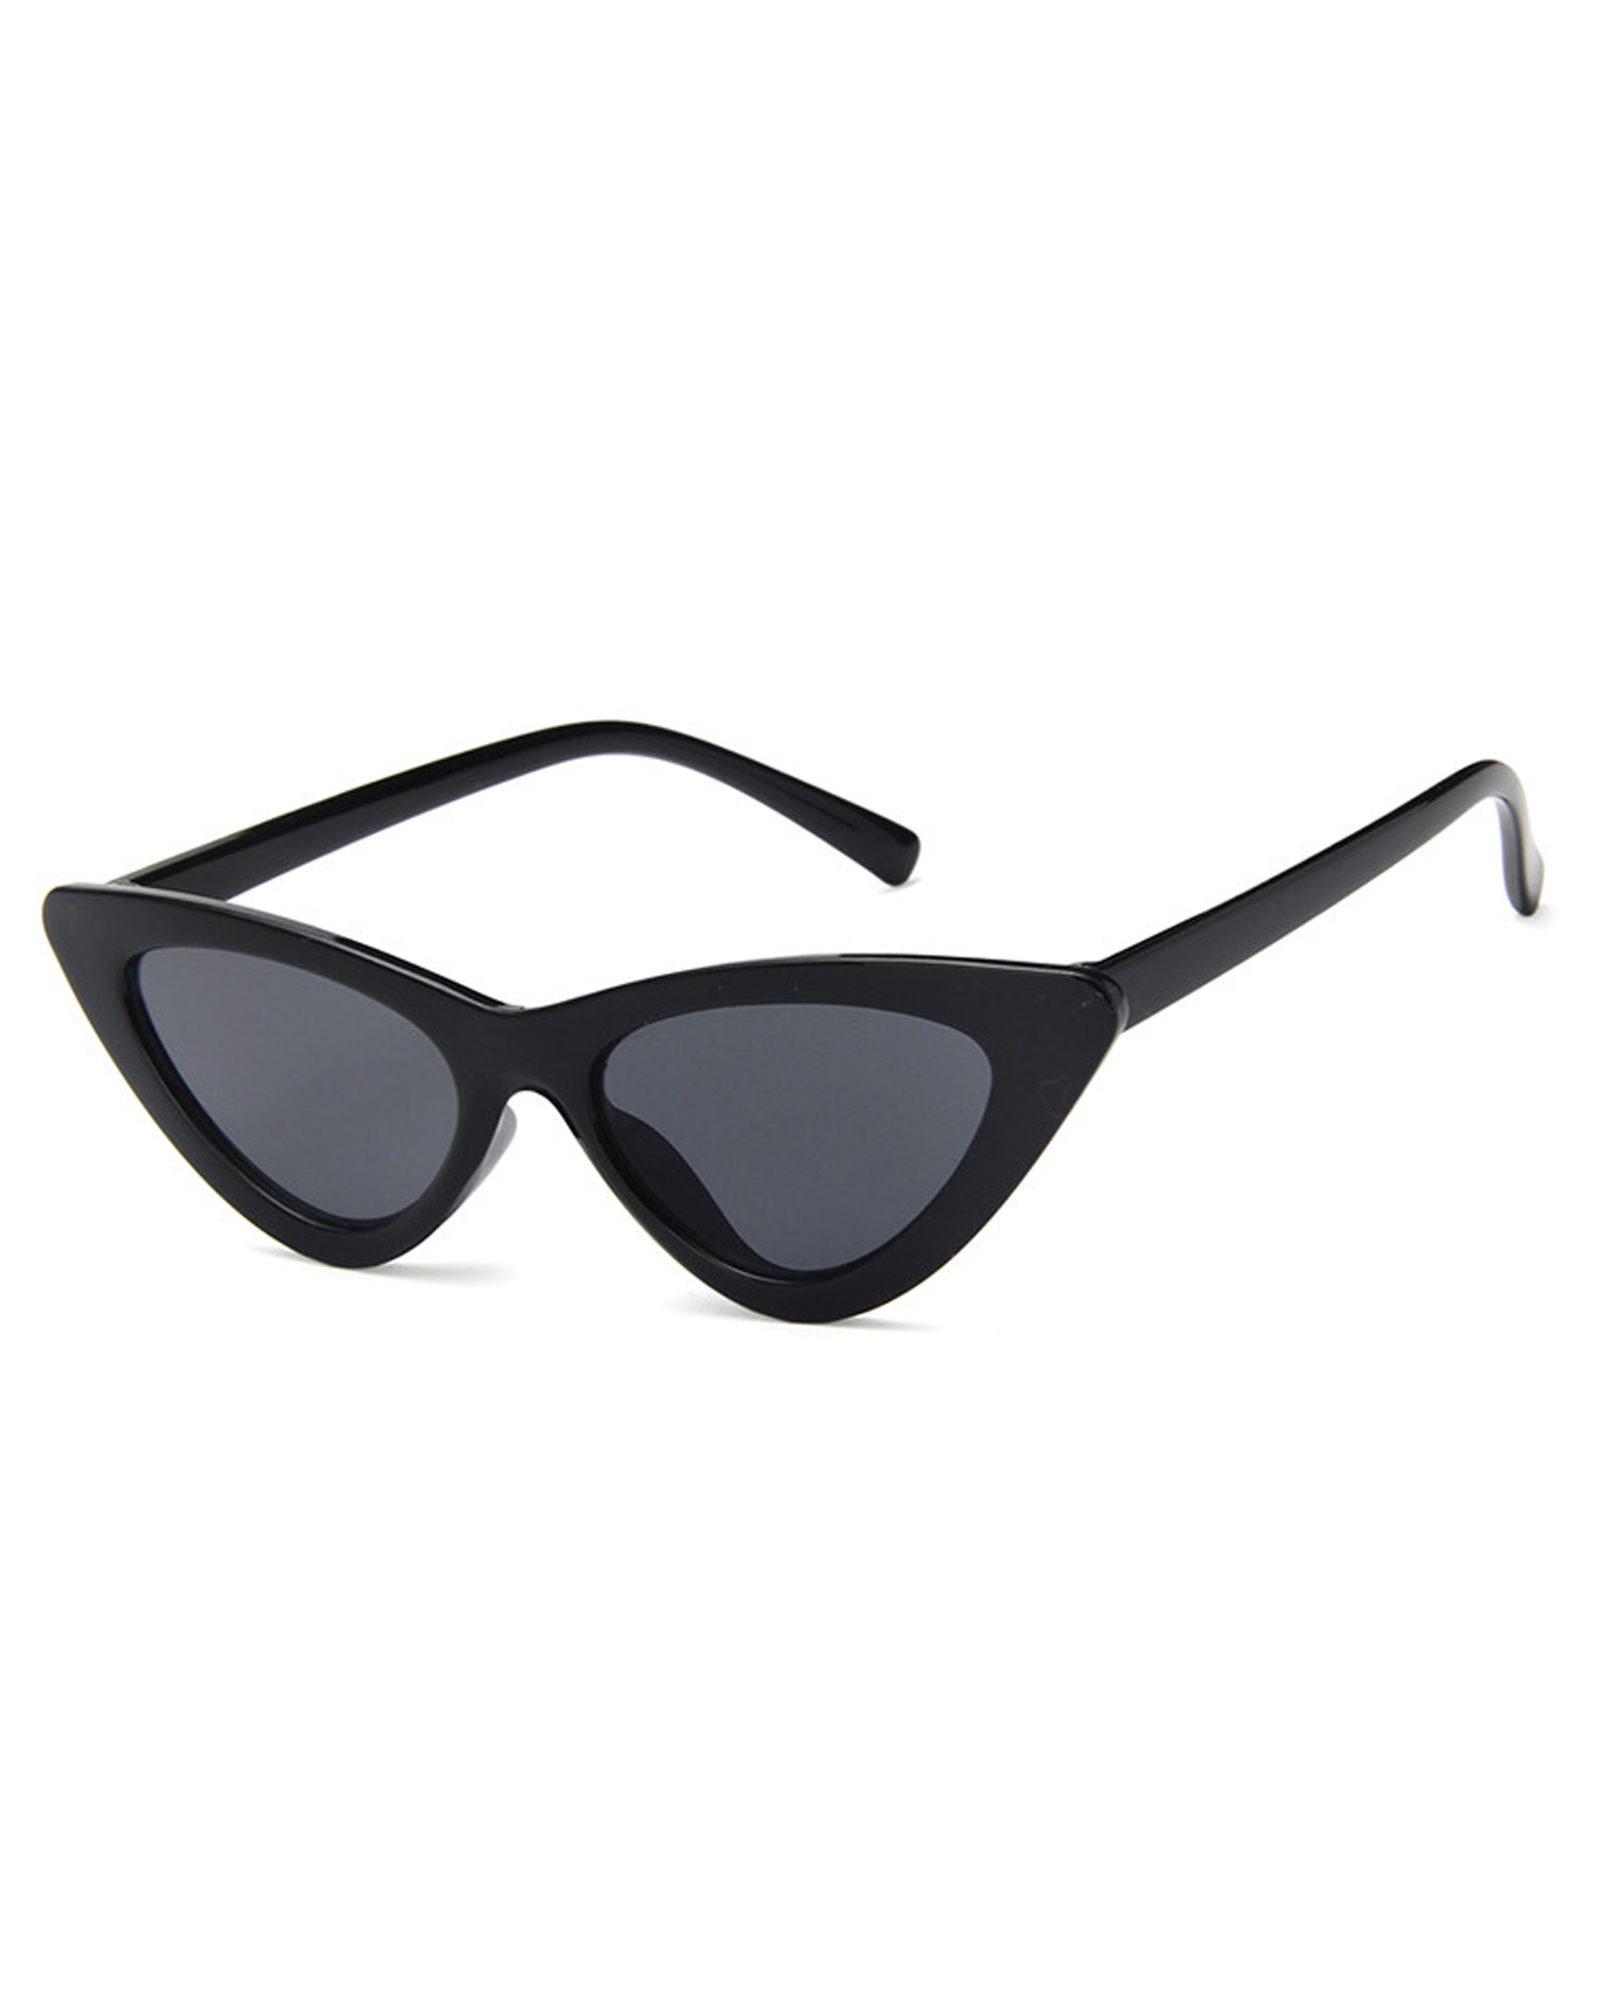 OOVY Cateye Kids Sunglasses